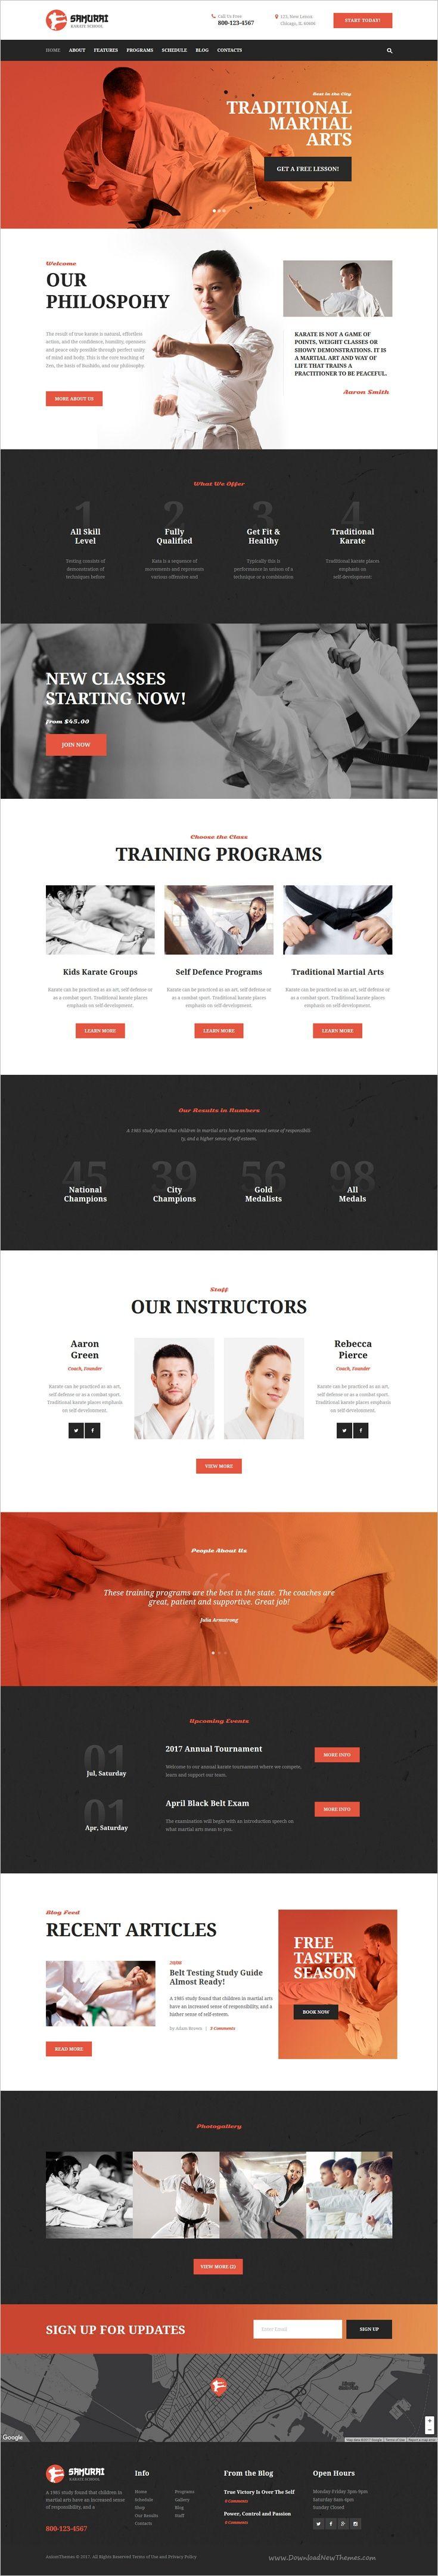 Samurai Karate School And Fitness Center Wordpress Theme Karate Karate School Personal Trainer Website